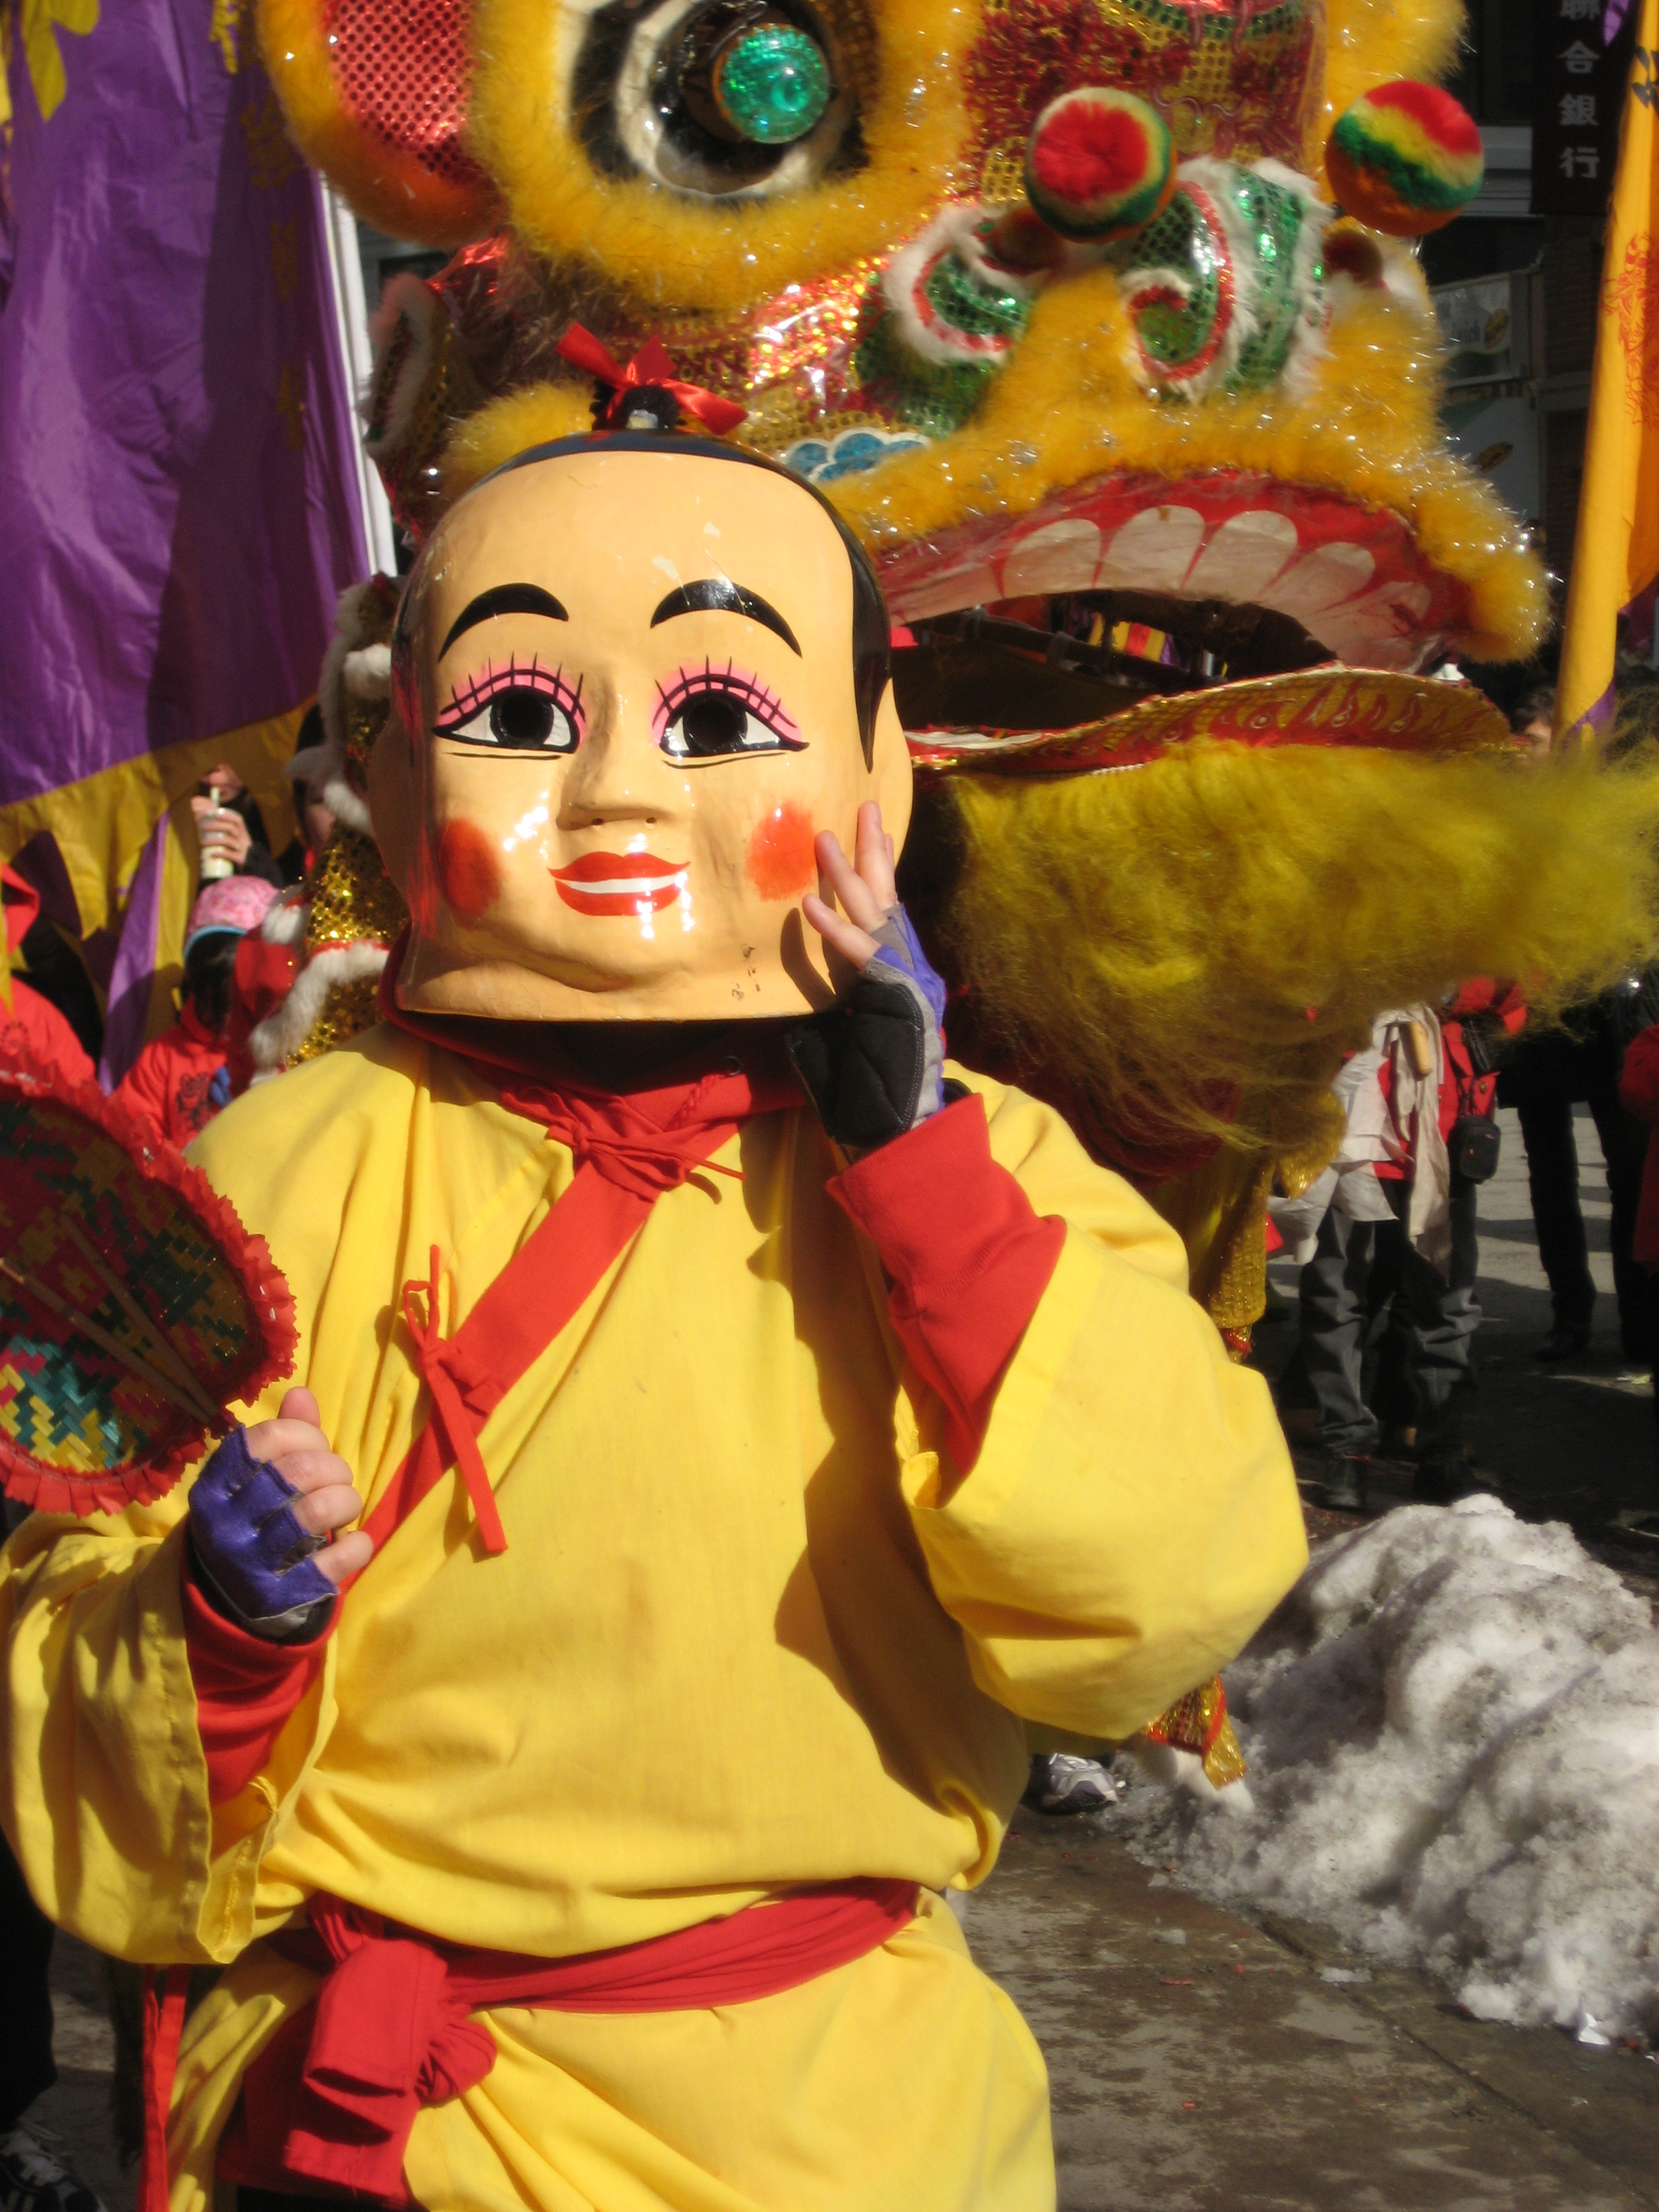 Chinese New Year parade in Boston, Massachusetts. Photo taken on February 1, 2009.